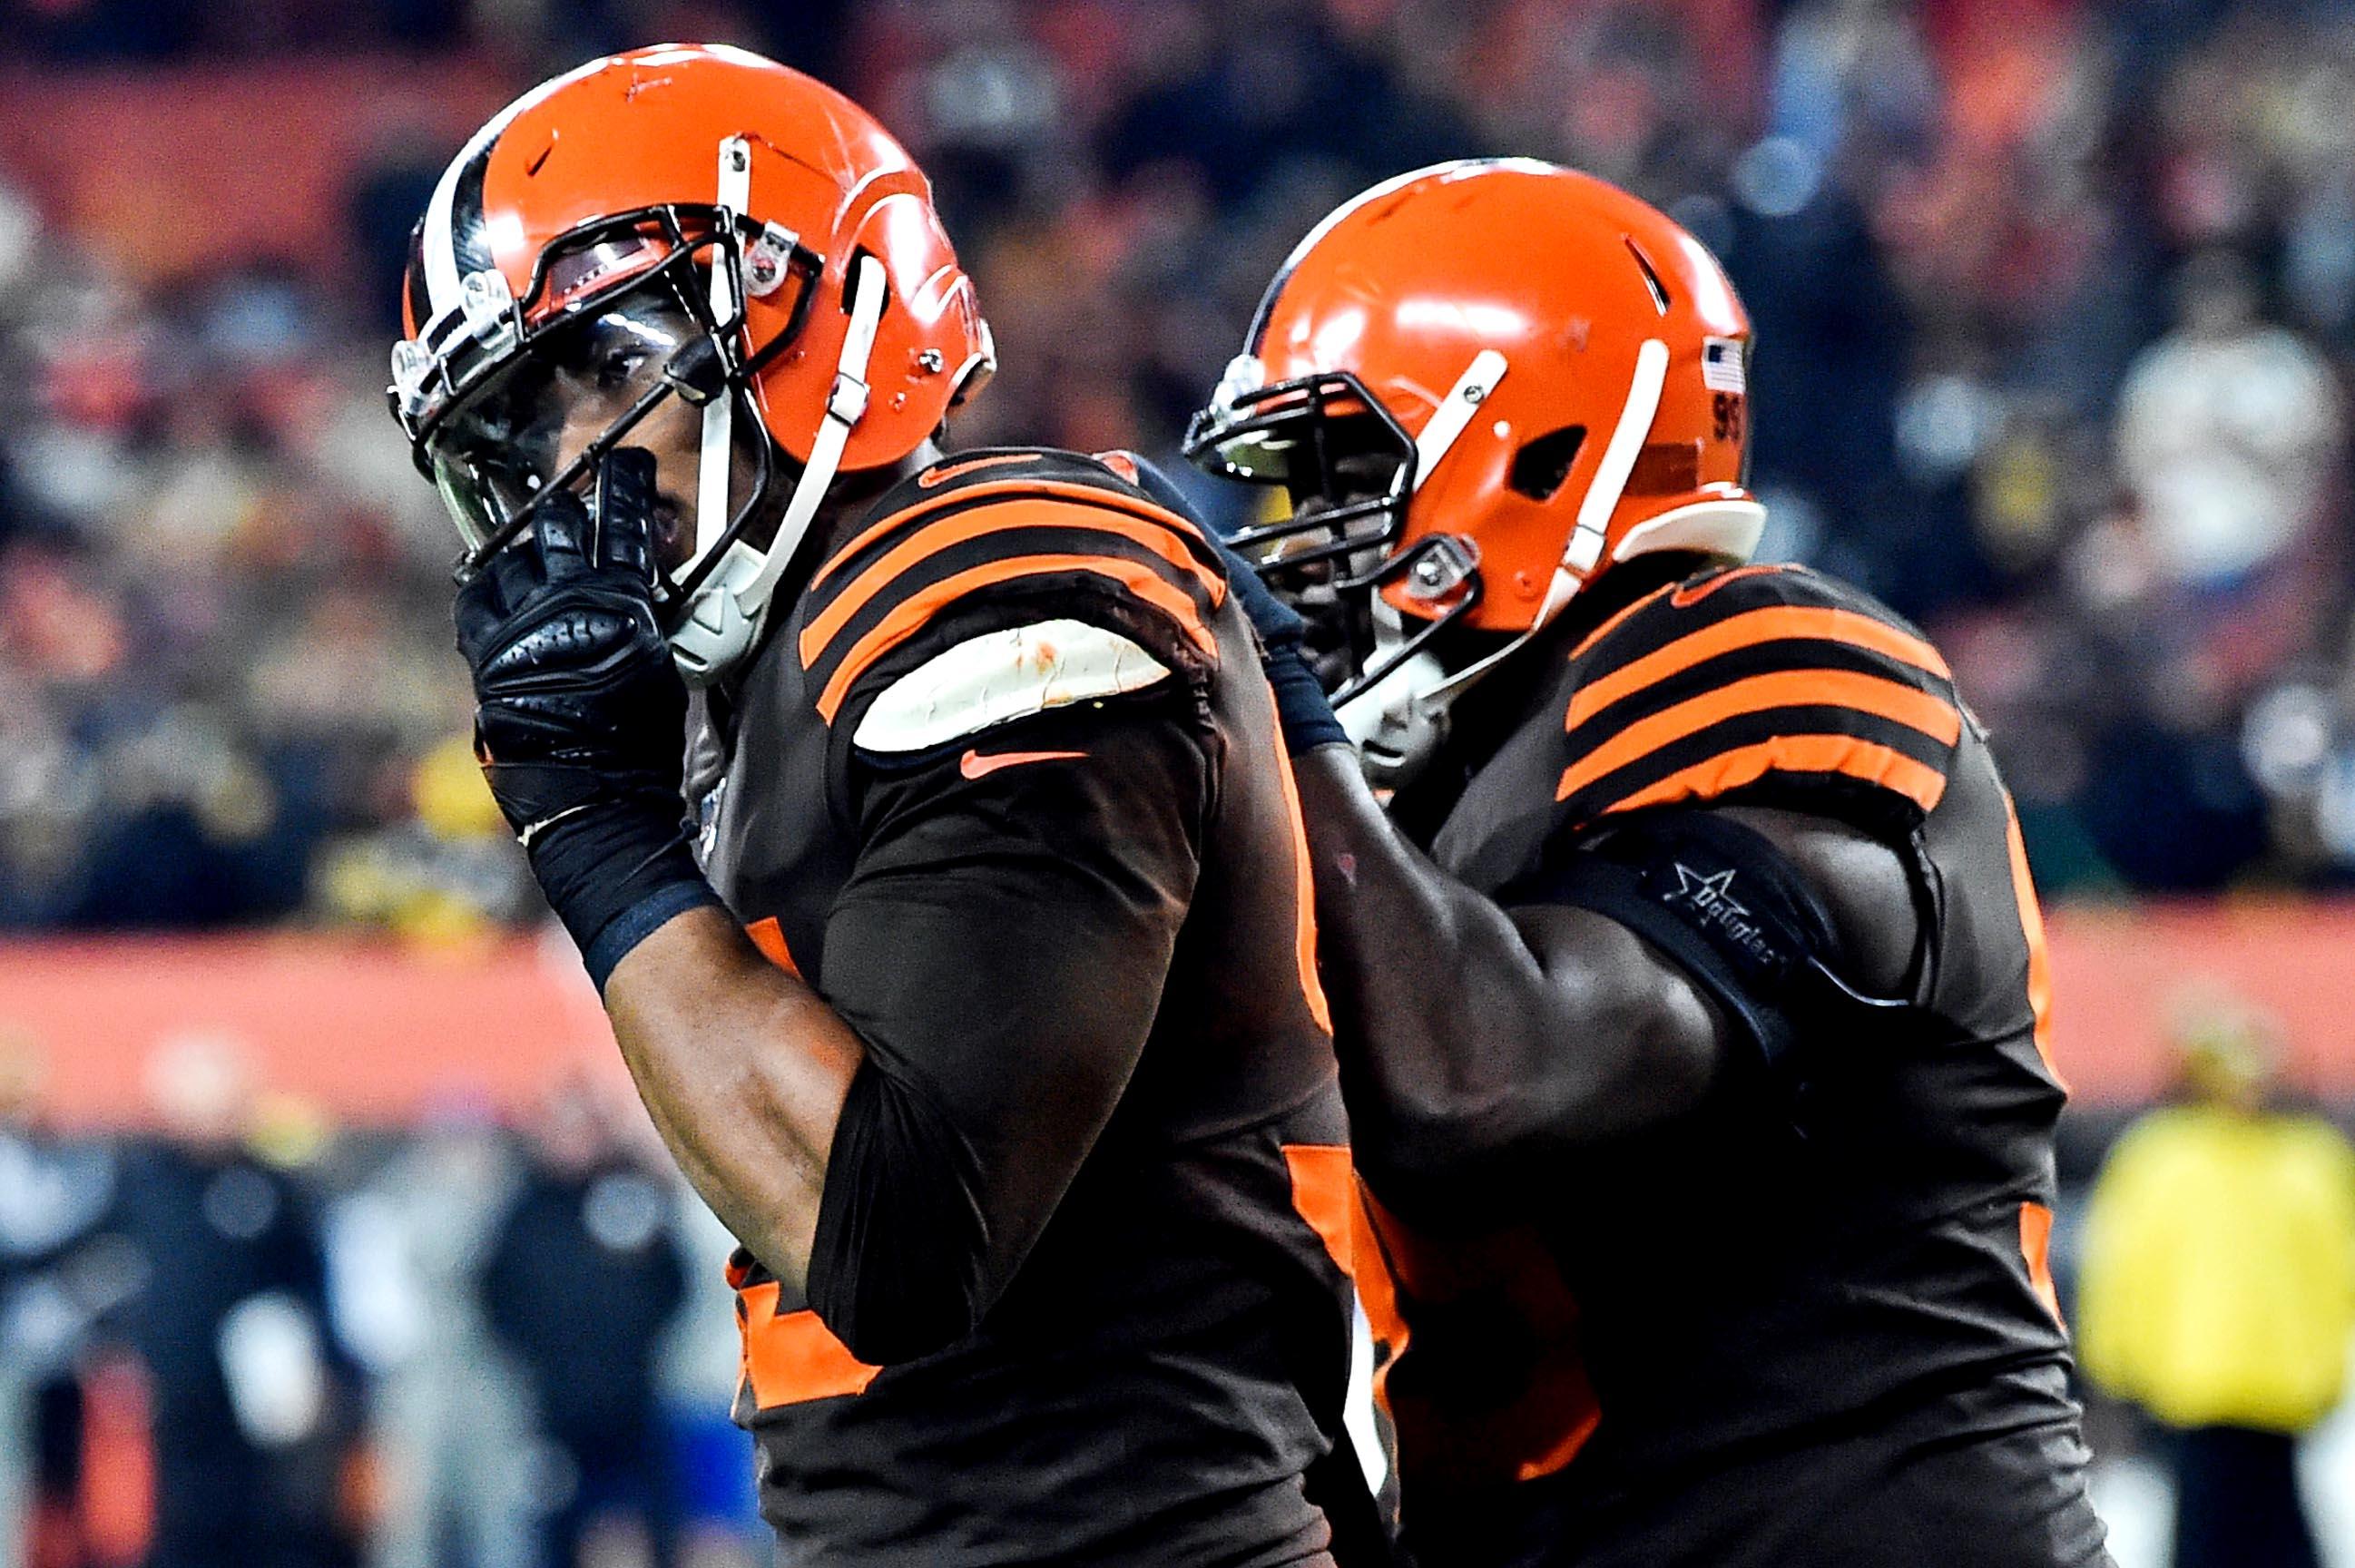 Browns LB Mack Wilson pokes fun at concussing JuJu Smith-Schuster in awful tweet